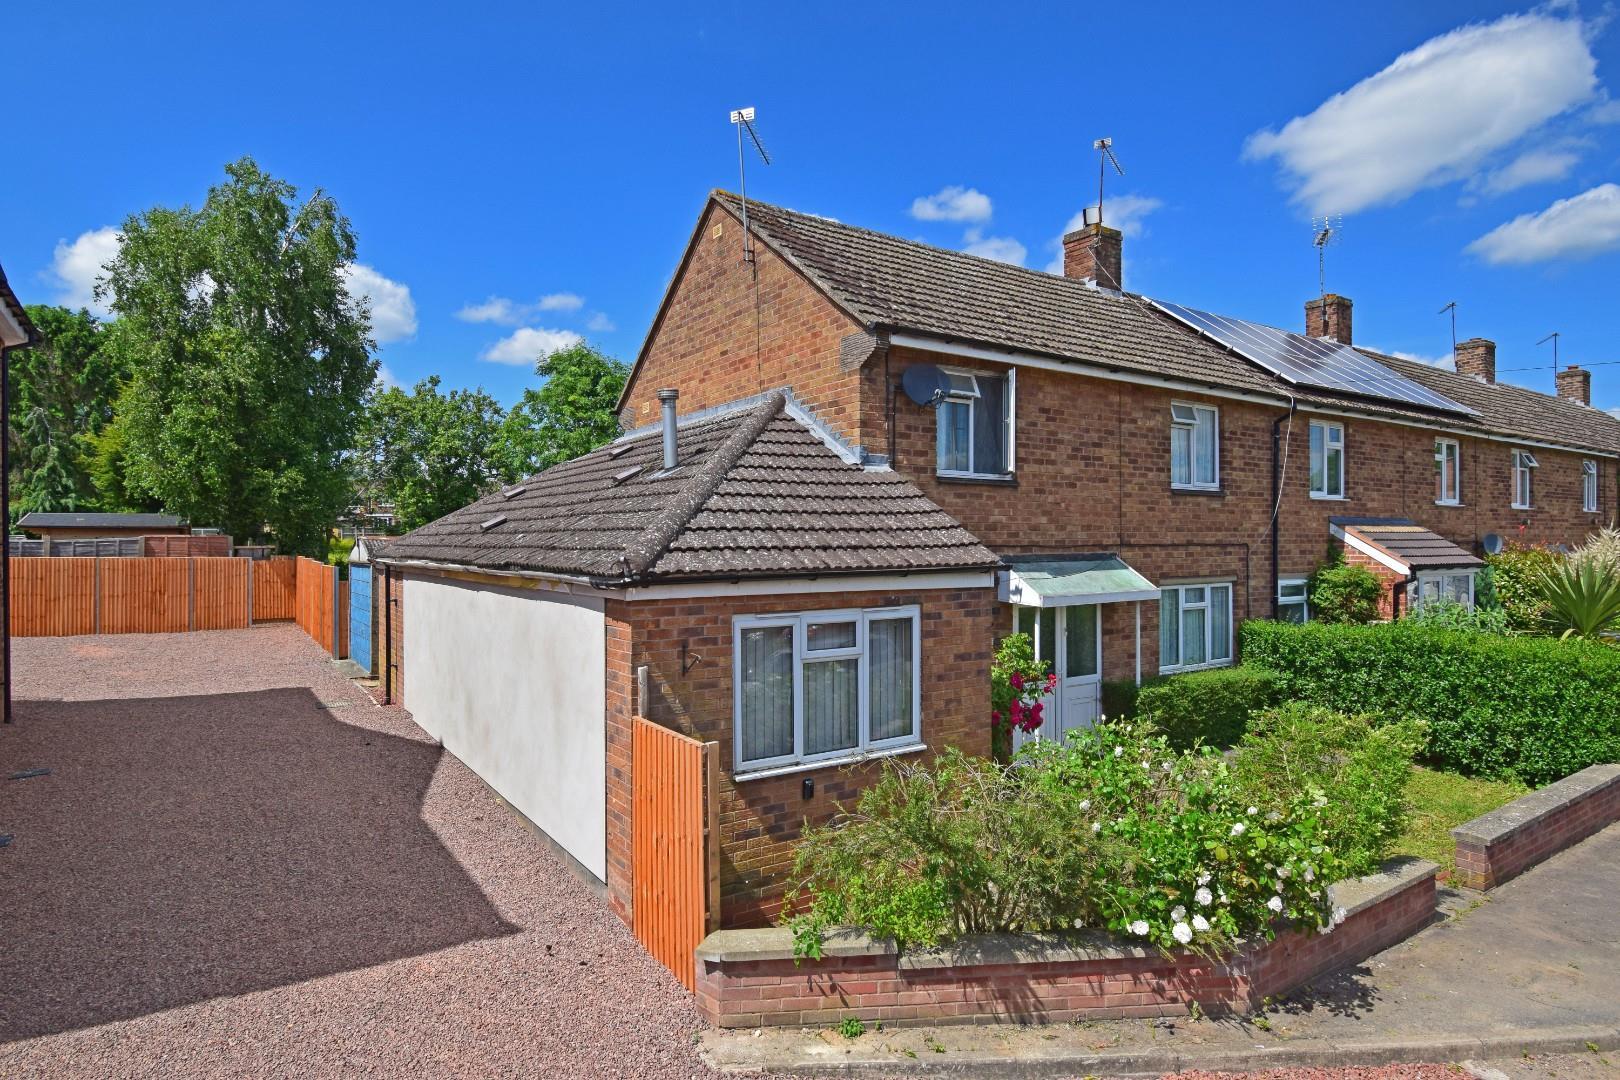 9 The Grove, Studley, Warwickshire, B80 7QL